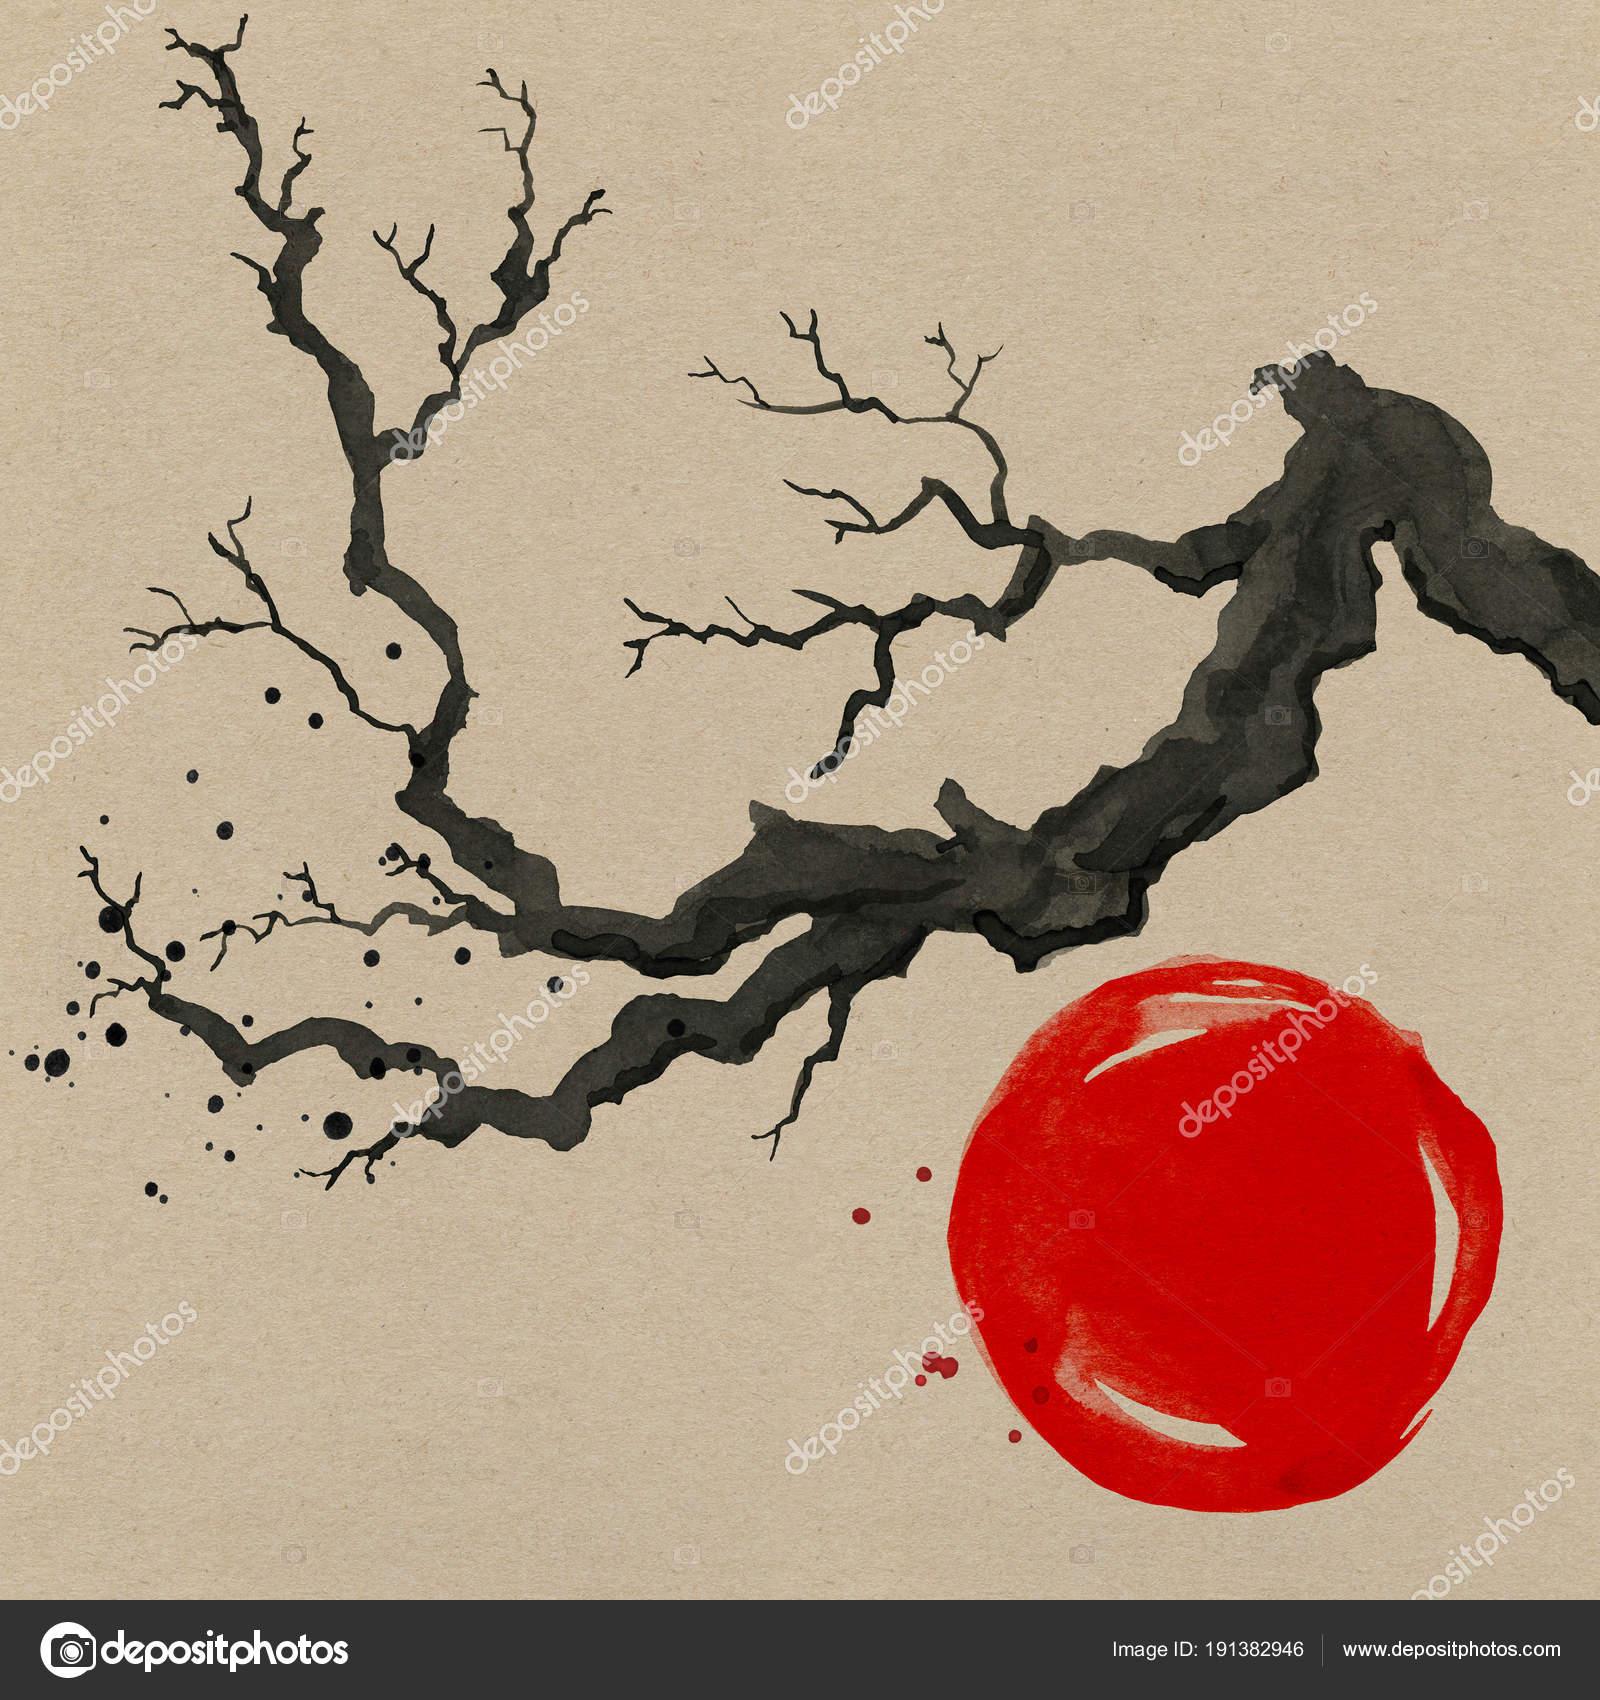 Stili e forme di pittura giapponese... Depositphotos_191382946-stock-photo-sakura-tree-in-japanese-style